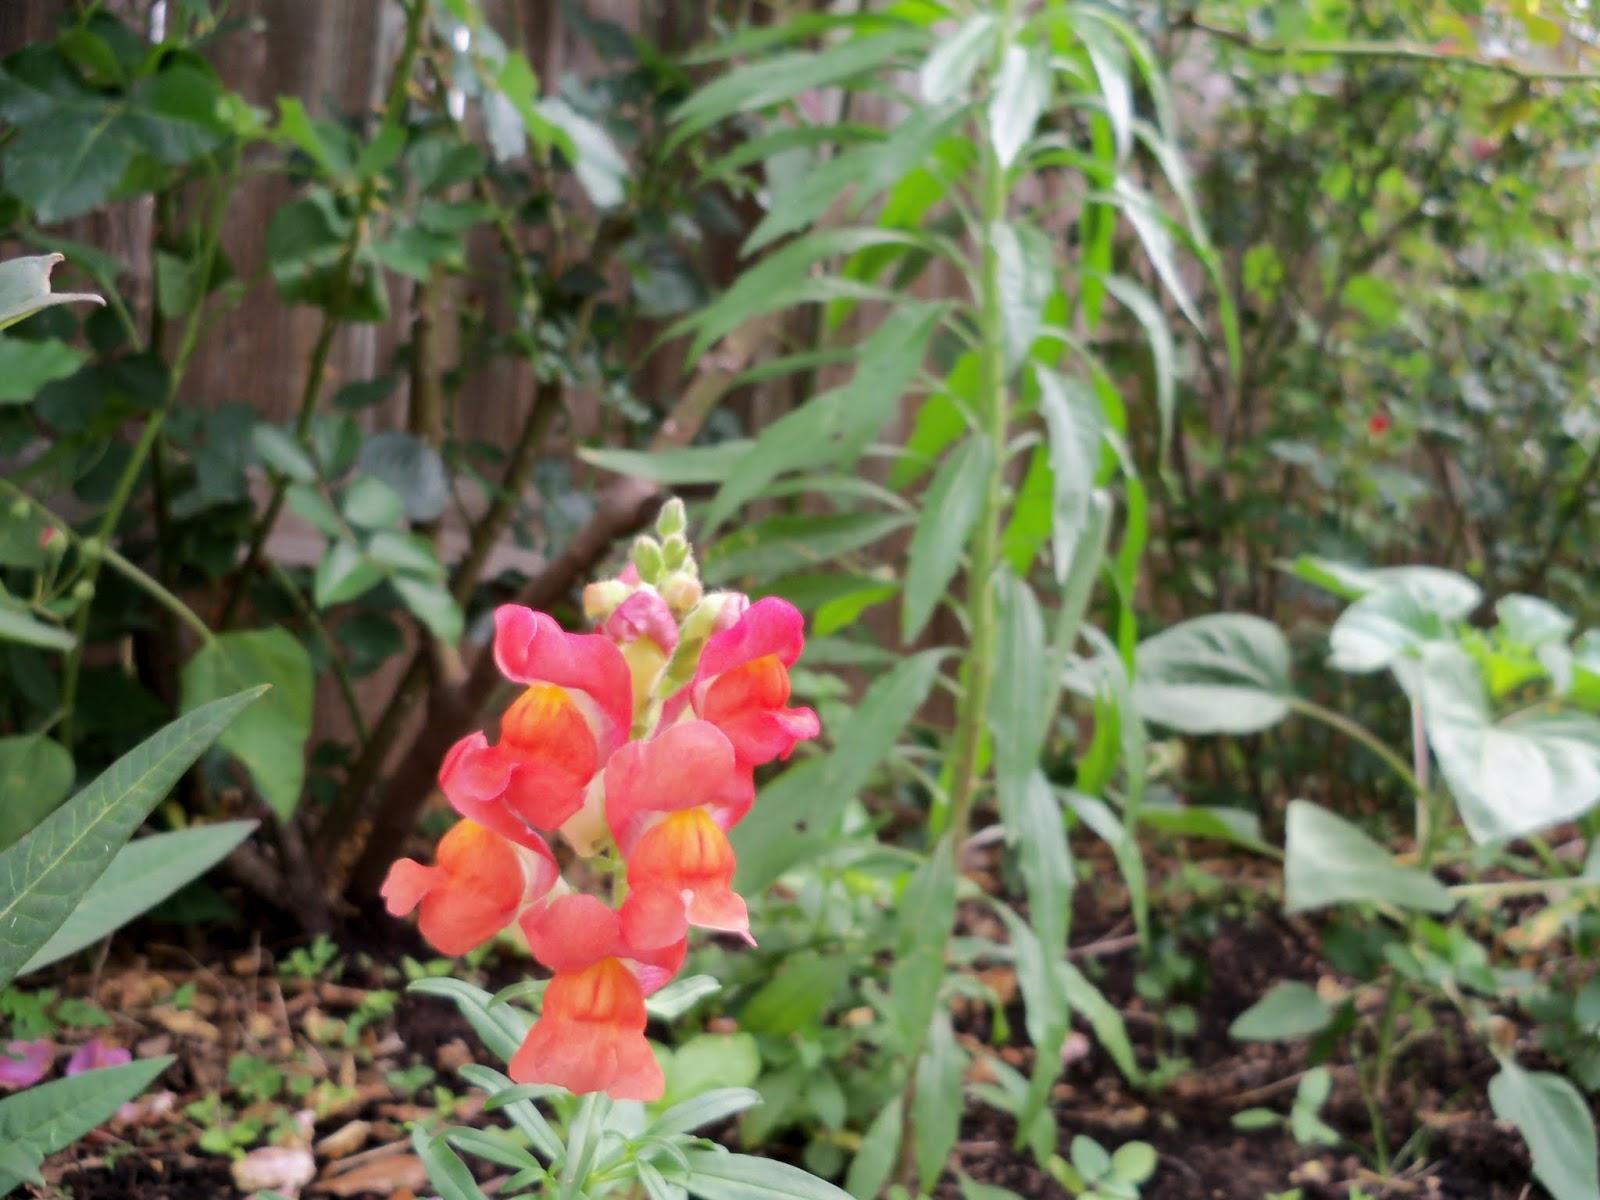 Gardening 2013 - 115_6057.JPG